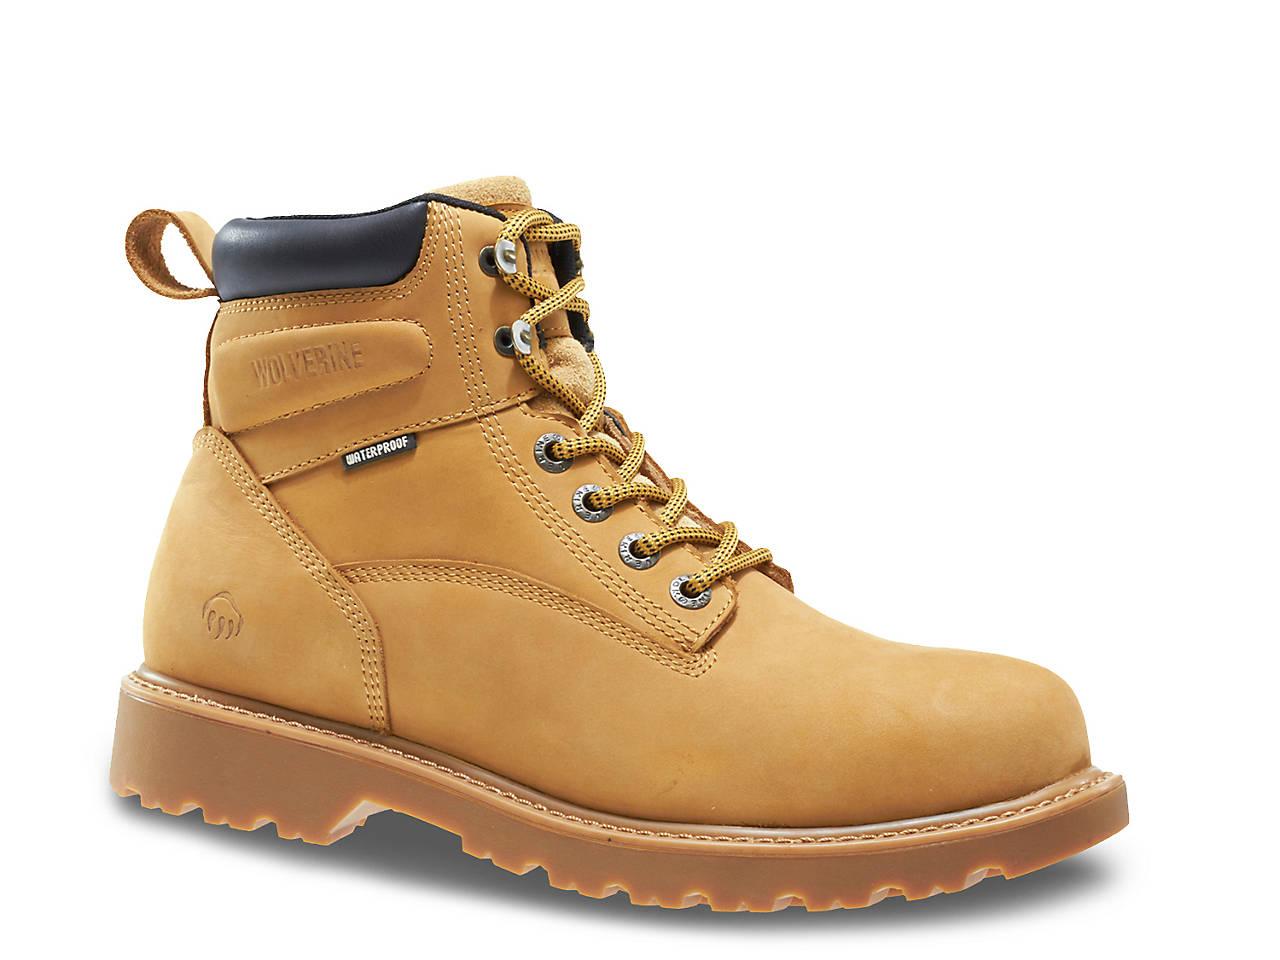 00ef7079aeb Floorhand Steel Toe Work Boot